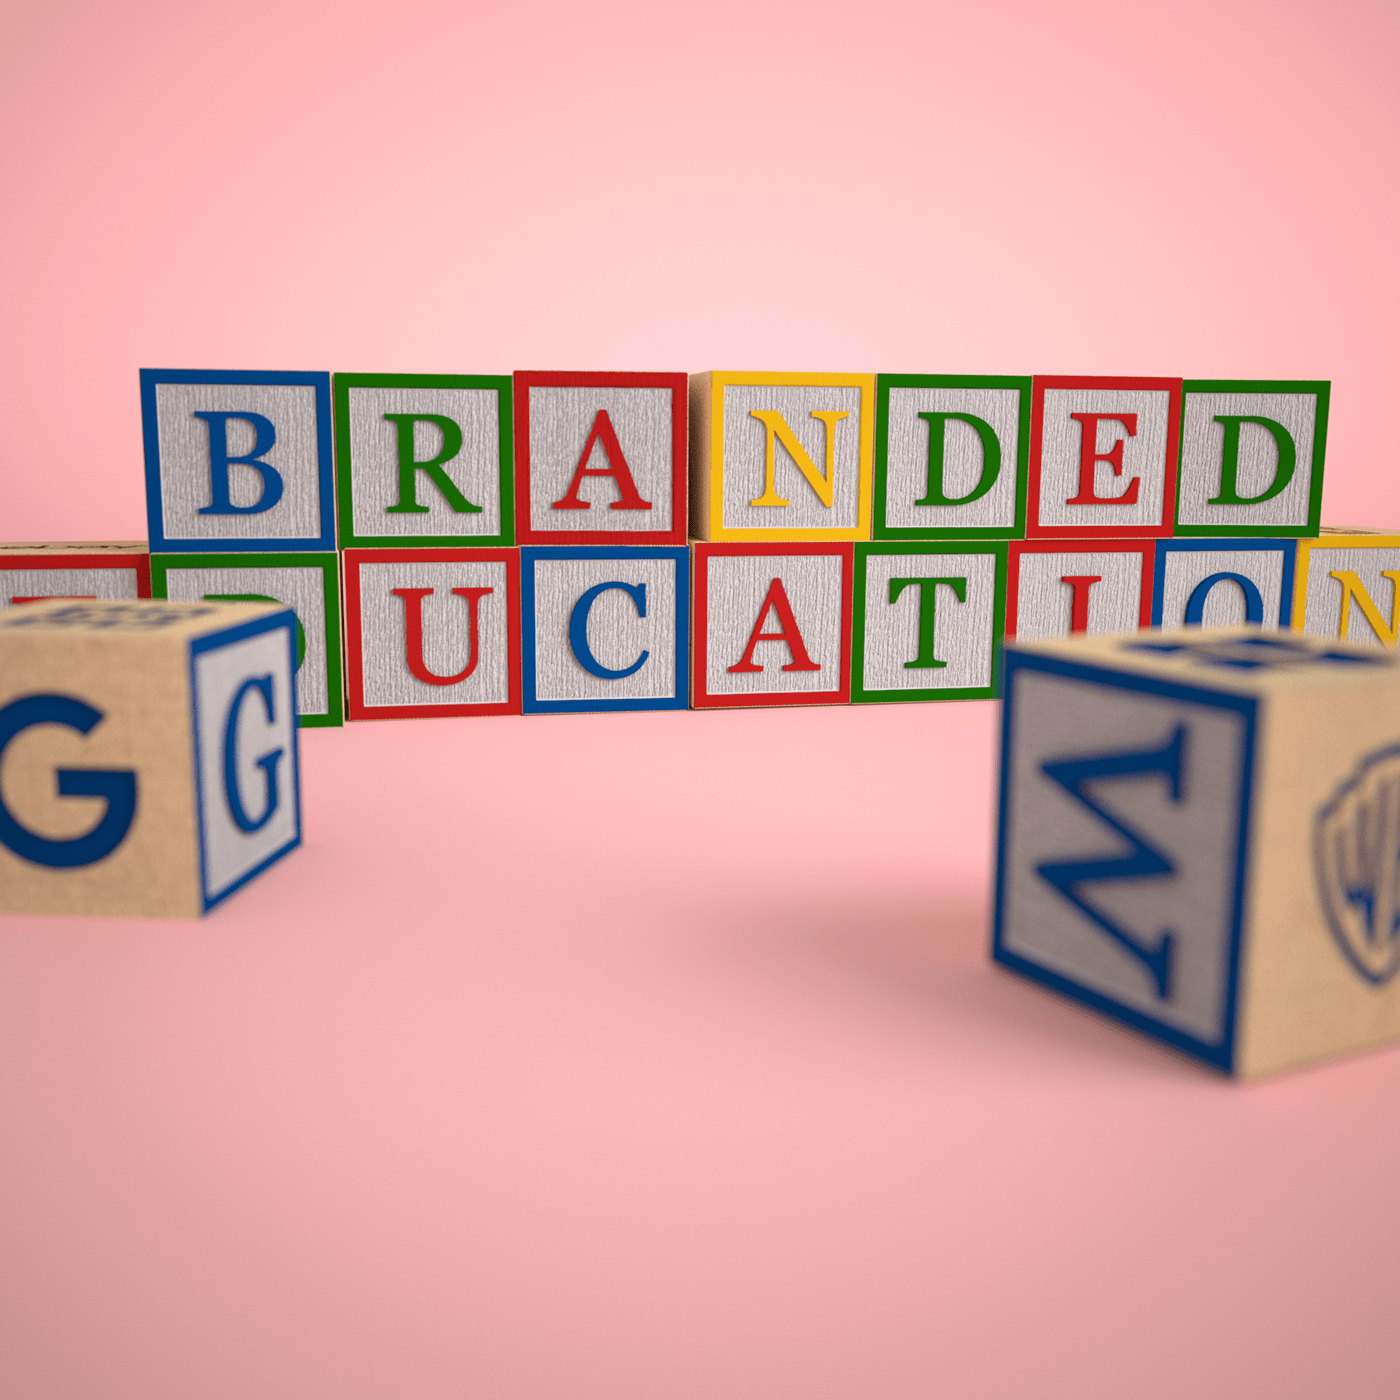 bran c4d childhood consumerism cube design editorial Education social toys